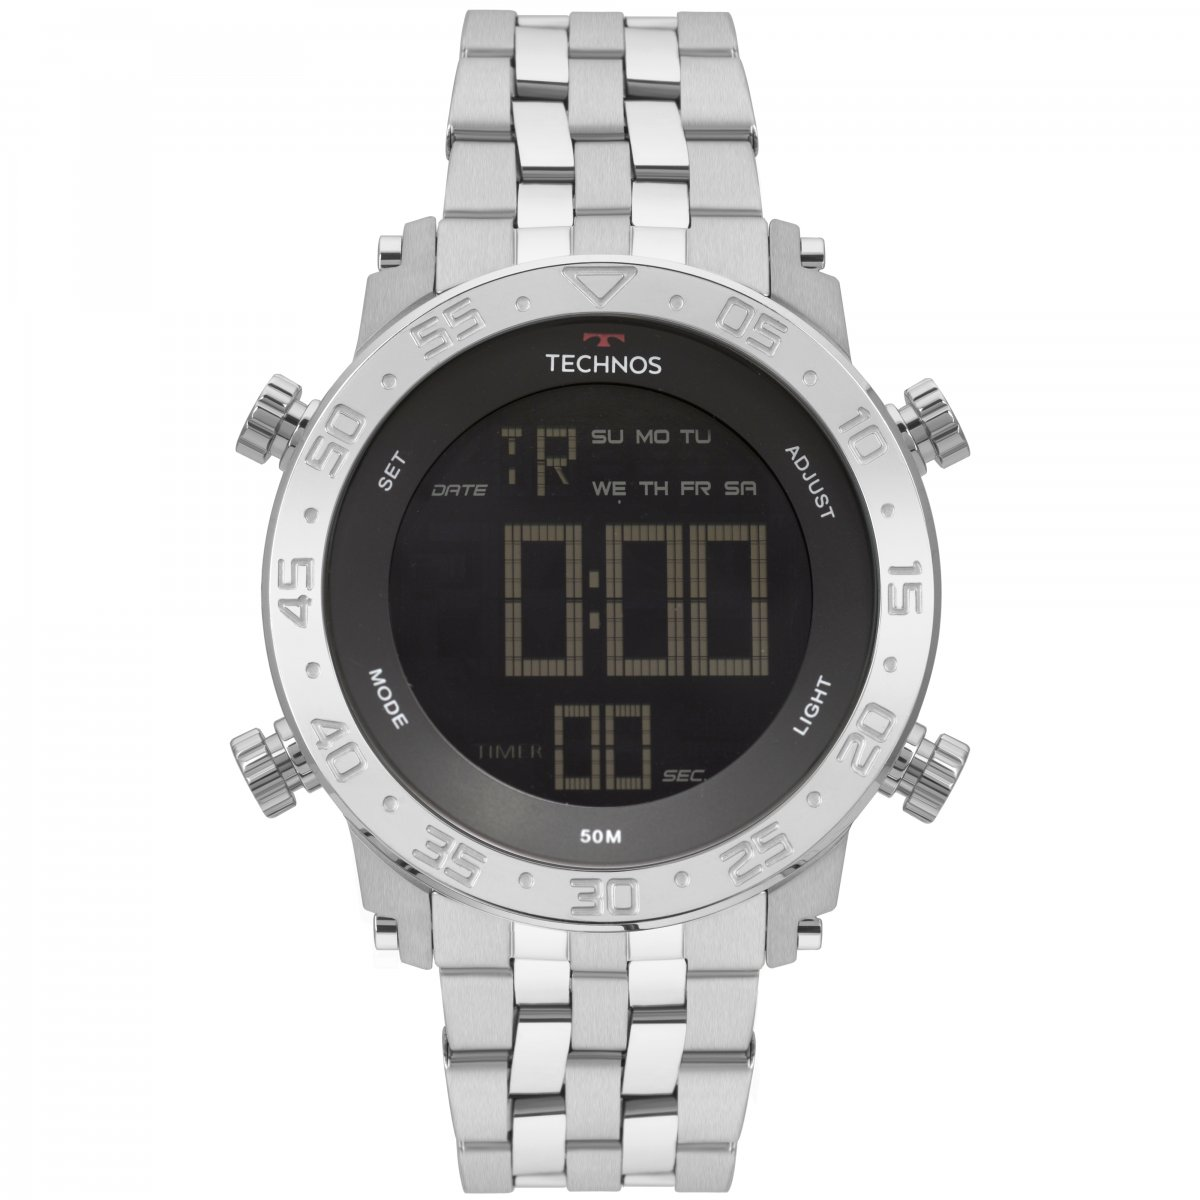 8434a124b89 Relógio Masculino · Technos · Relógio Technos Digital BJK006AB 1P